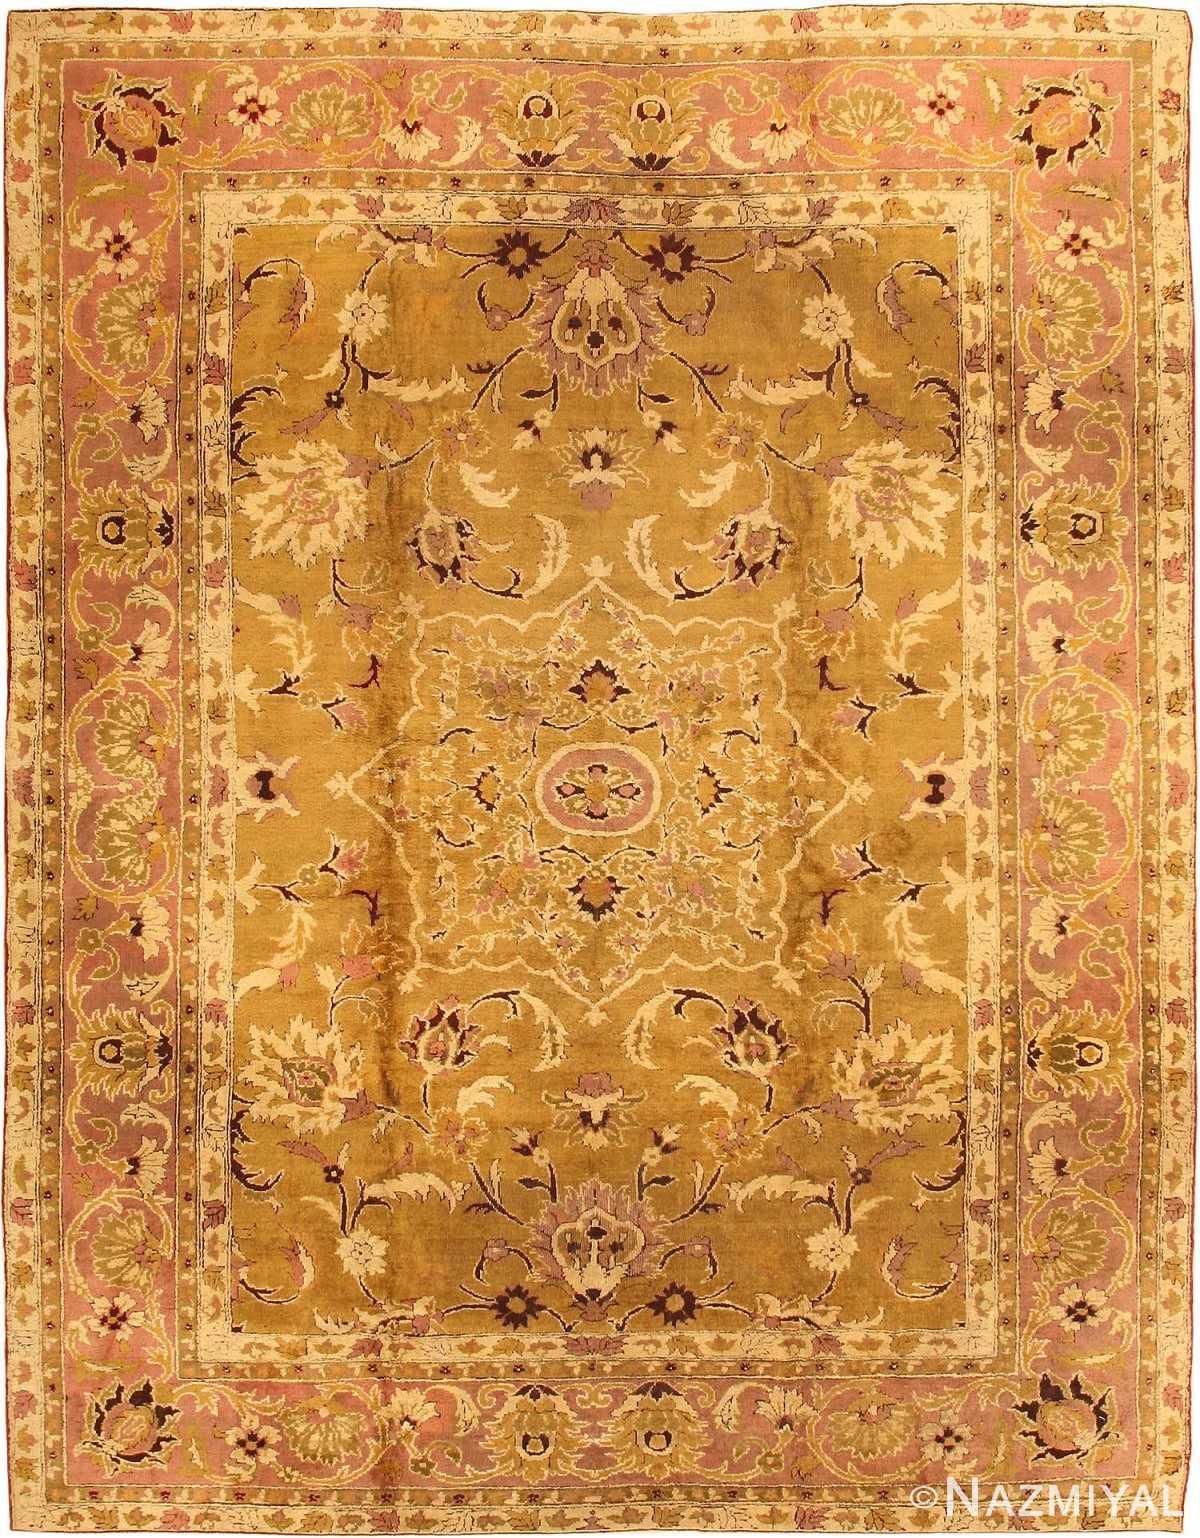 Antique Amritsar Rug 1227 Detail/Large View